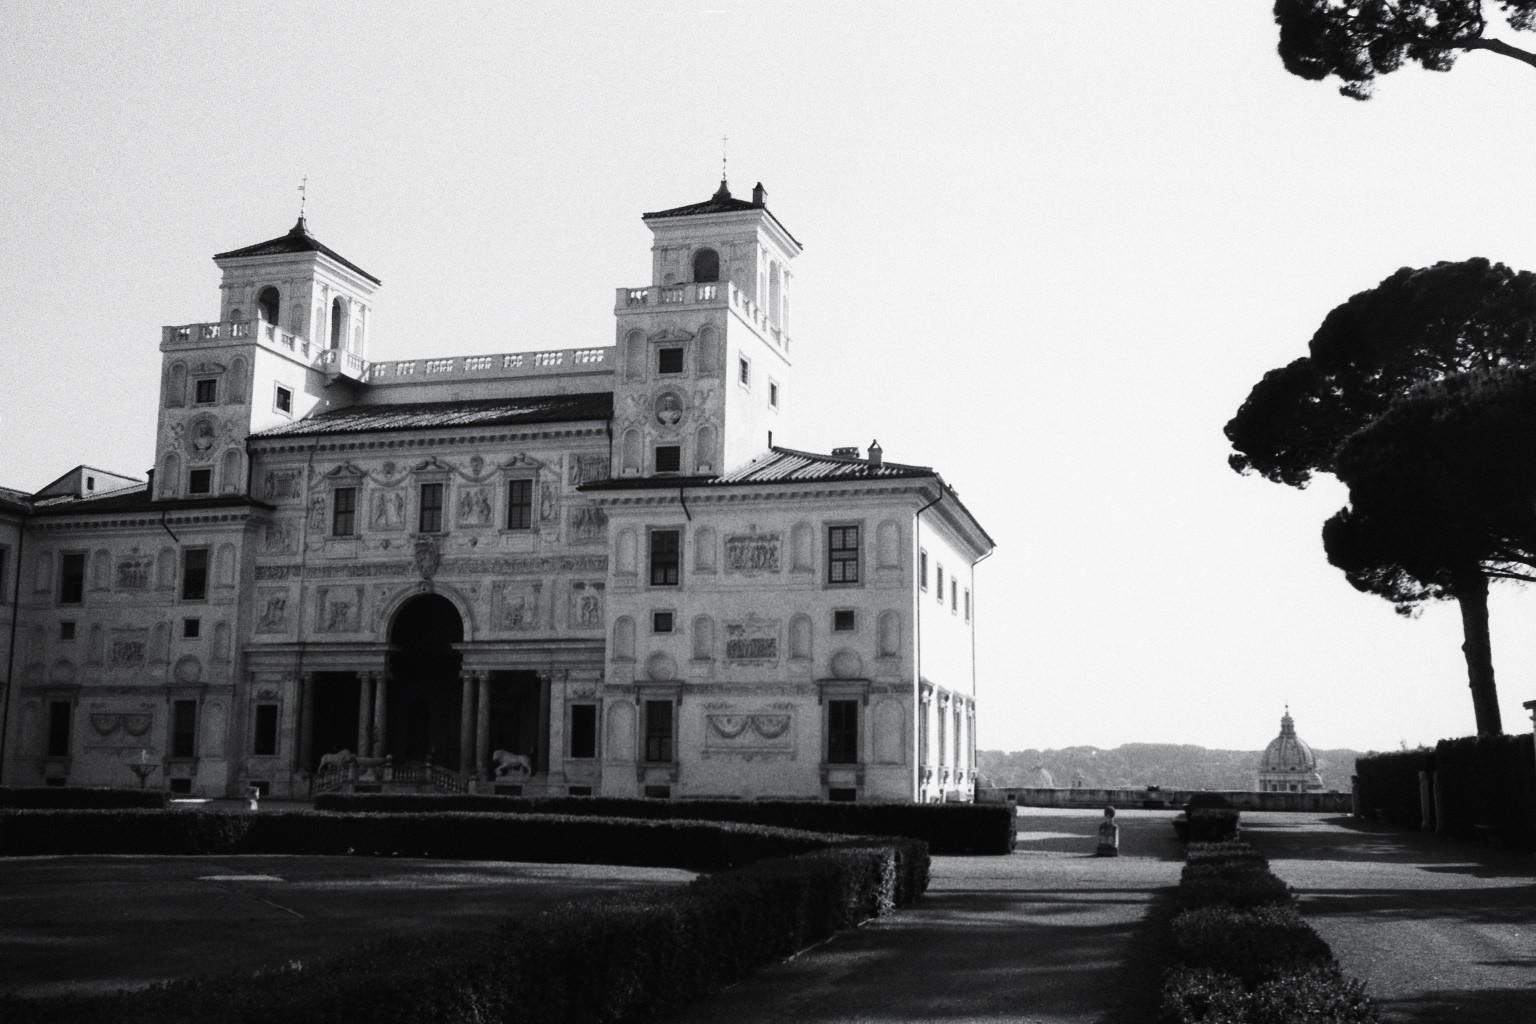 La villa de Medicis